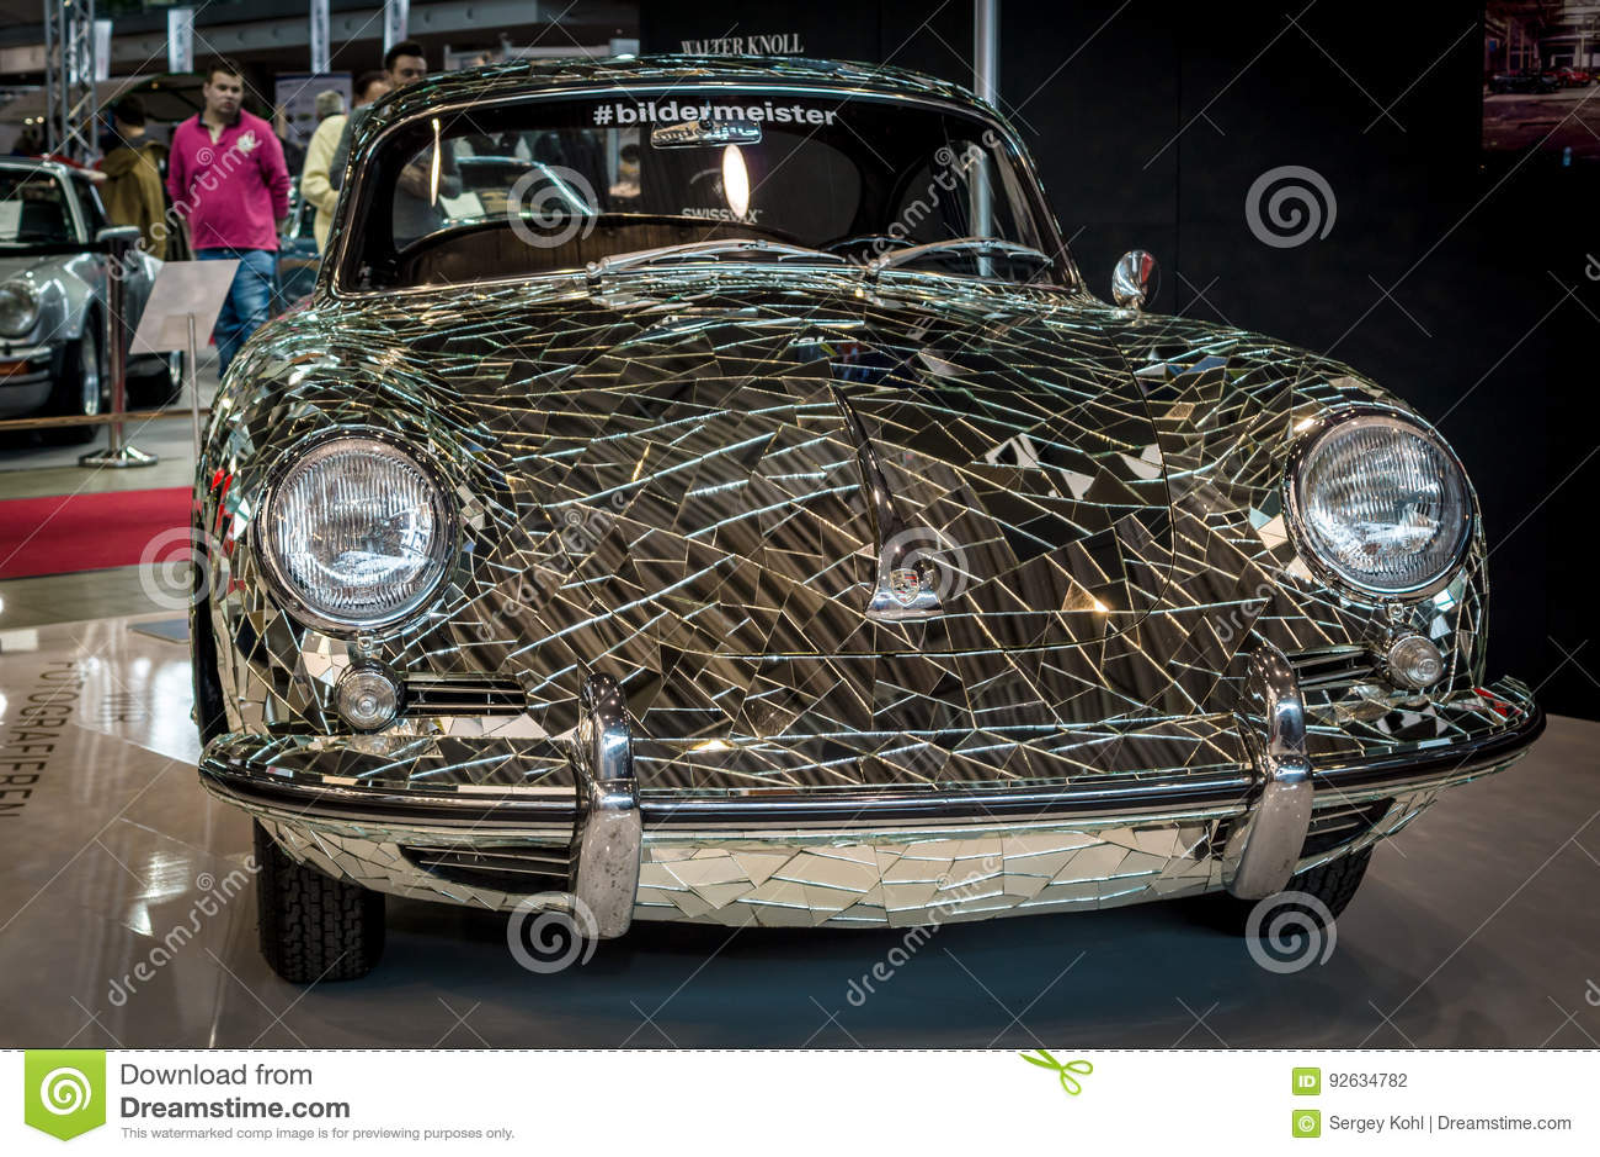 Art Installation Mirror Car Based On Porsche 356 By Artist Gustav Troger Mirrorman Editorial Photography Image Of Prestige Gustav 92634782